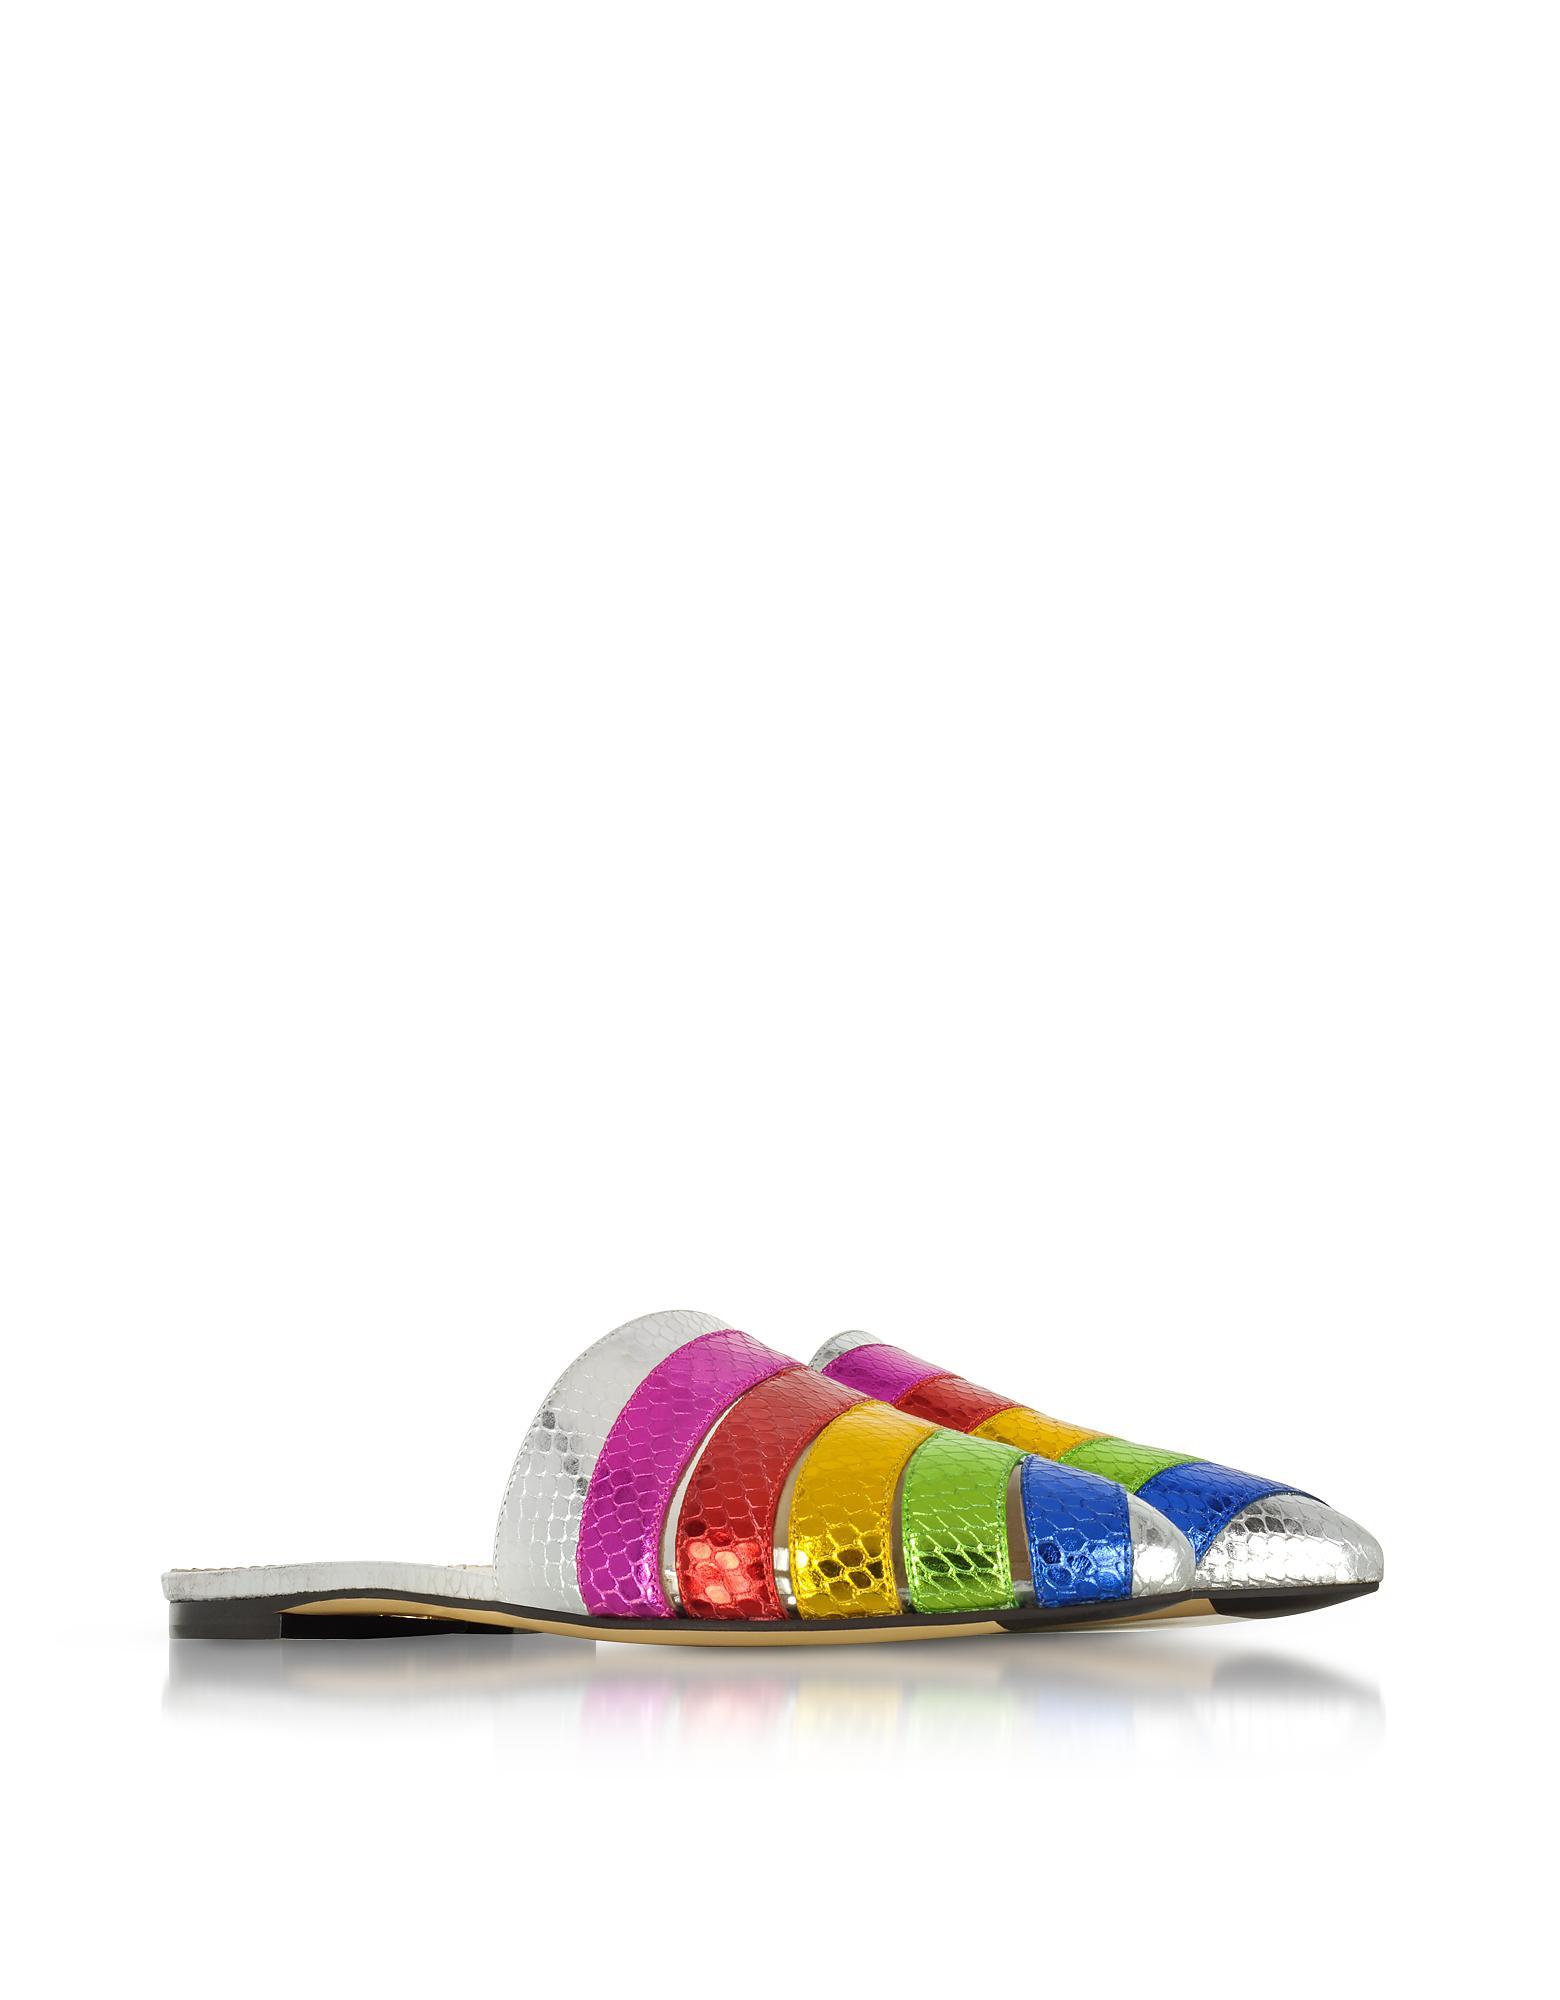 9f8ea01522d Charlotte Olympia Metallic Snake-print Leather Technicolor Slides - Save  63.70302474793767% - Lyst